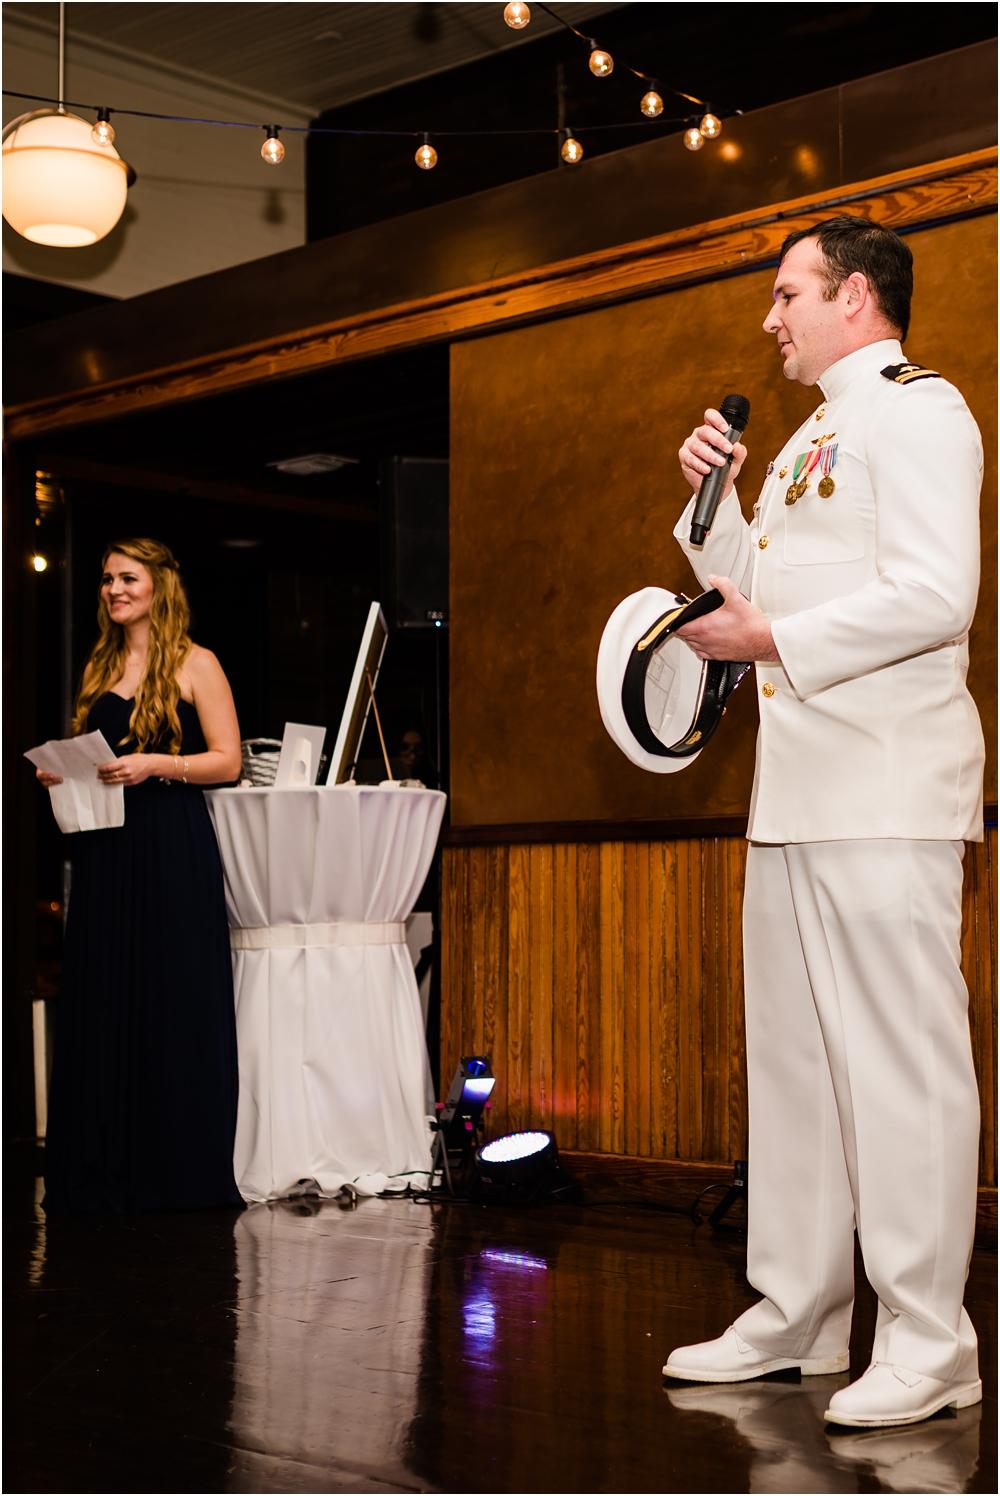 oconnor-pensacola-florida-wedding-photographer-kiersten-taylor-100.jpg